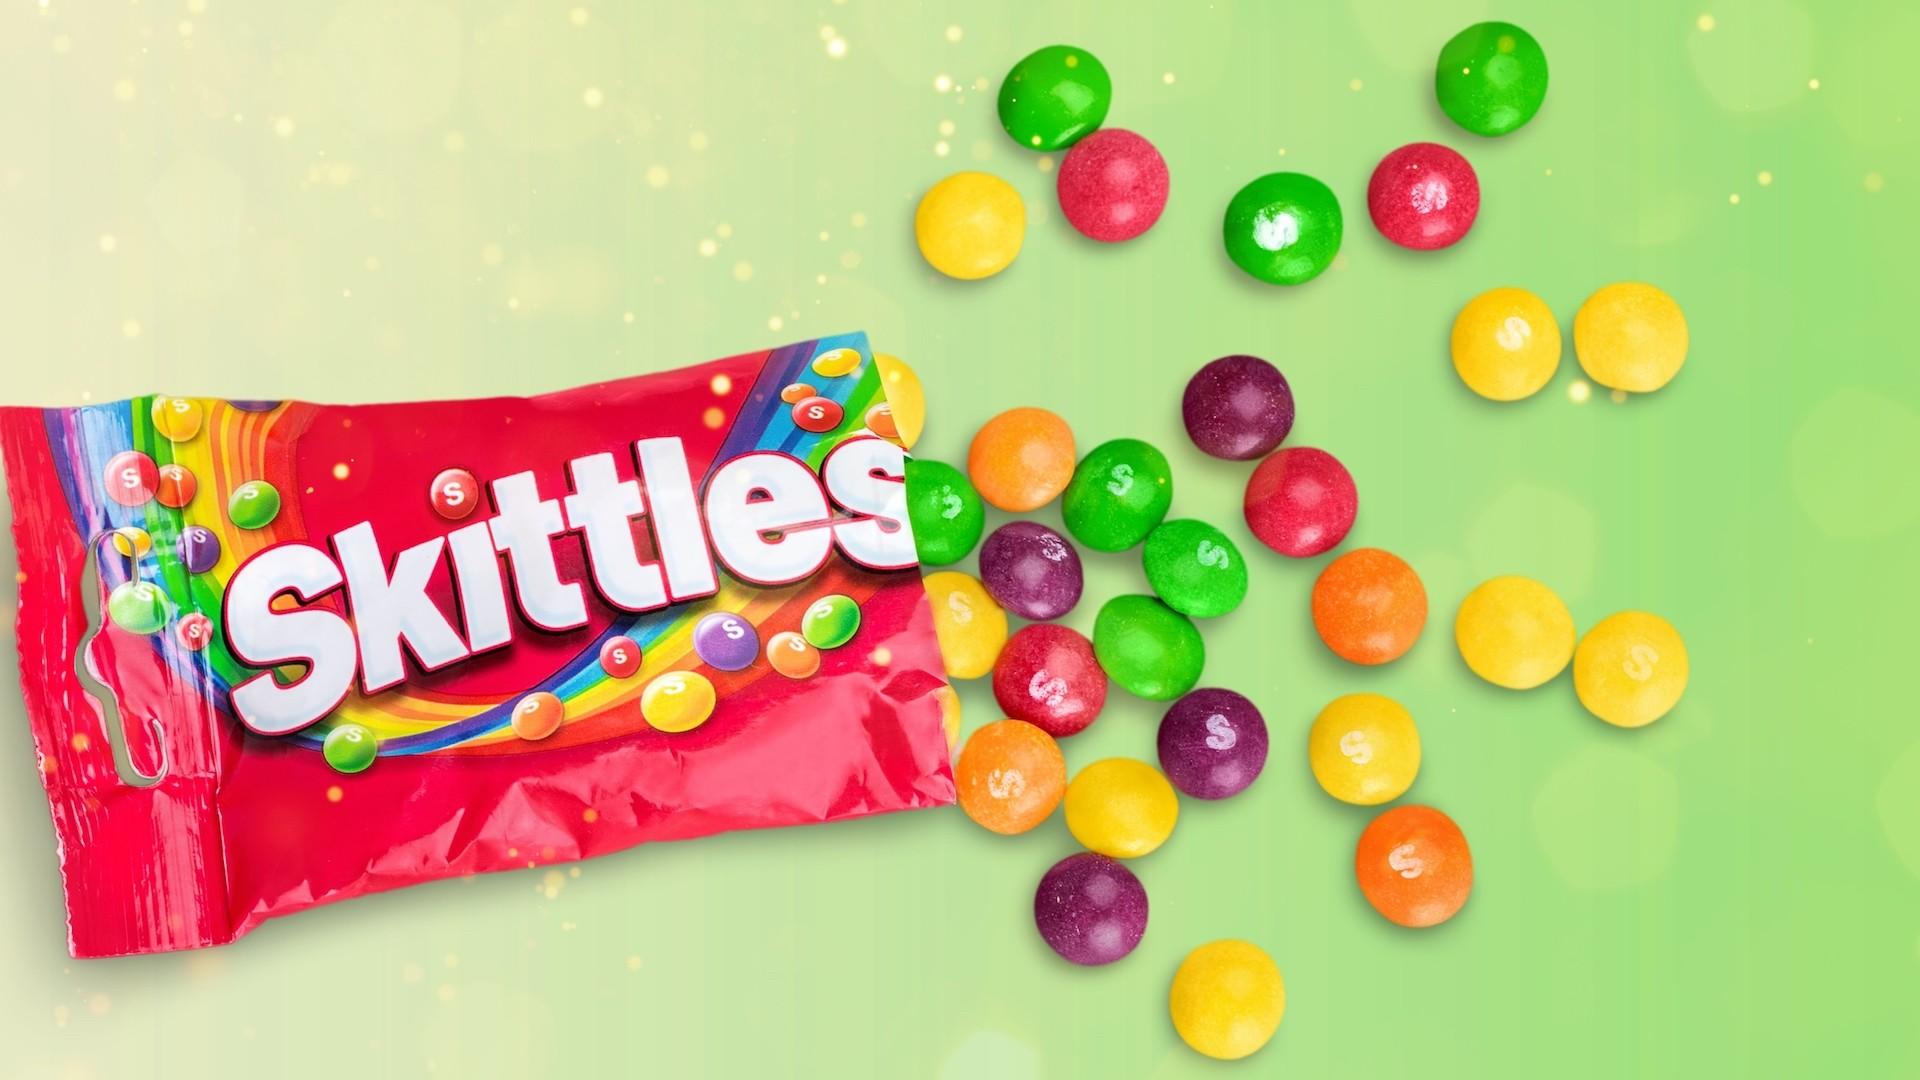 Skittles free hd wallpaper